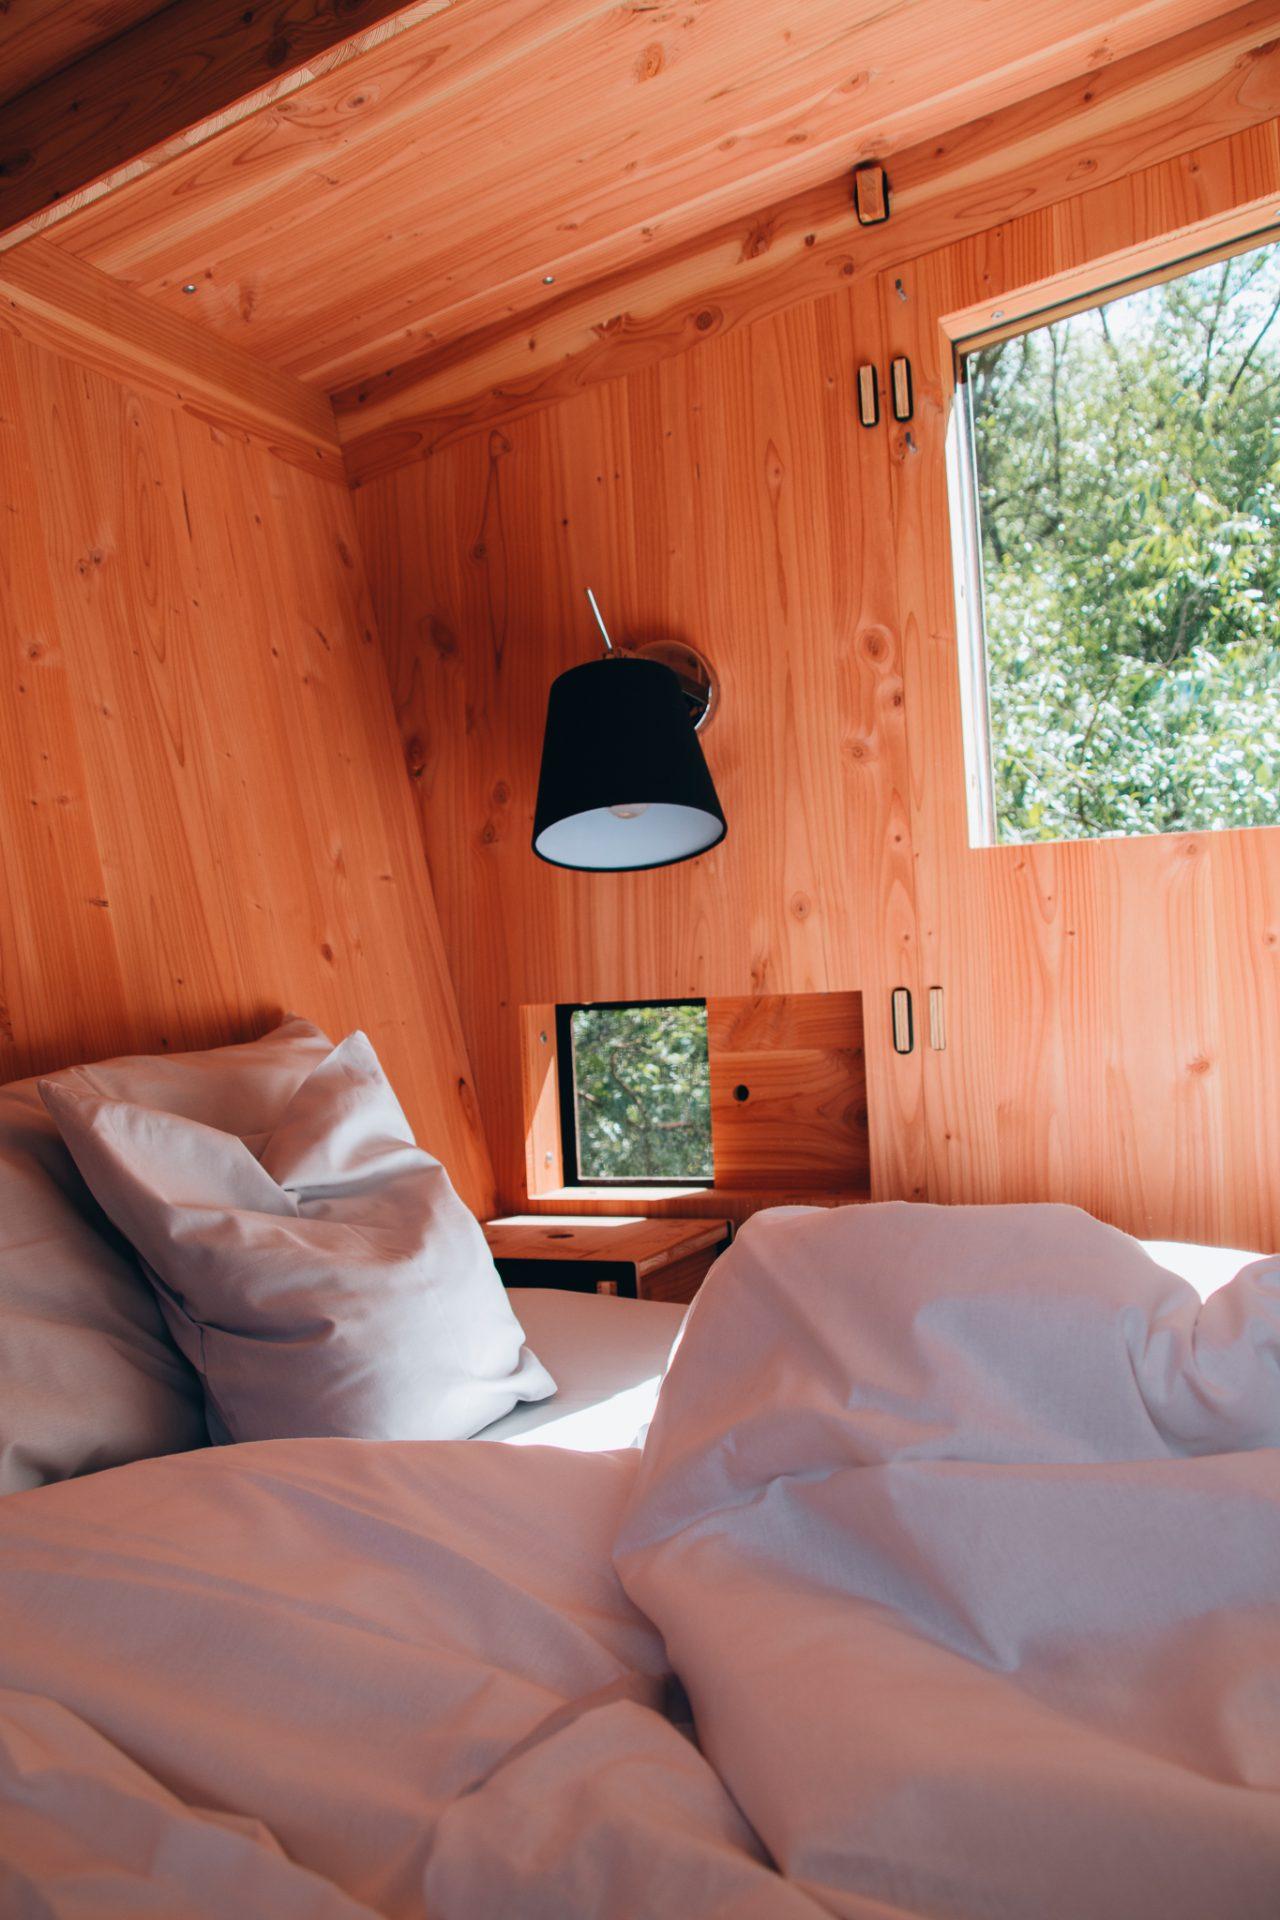 destinature-dorf-tiny-house-urlaub-hütte-plus